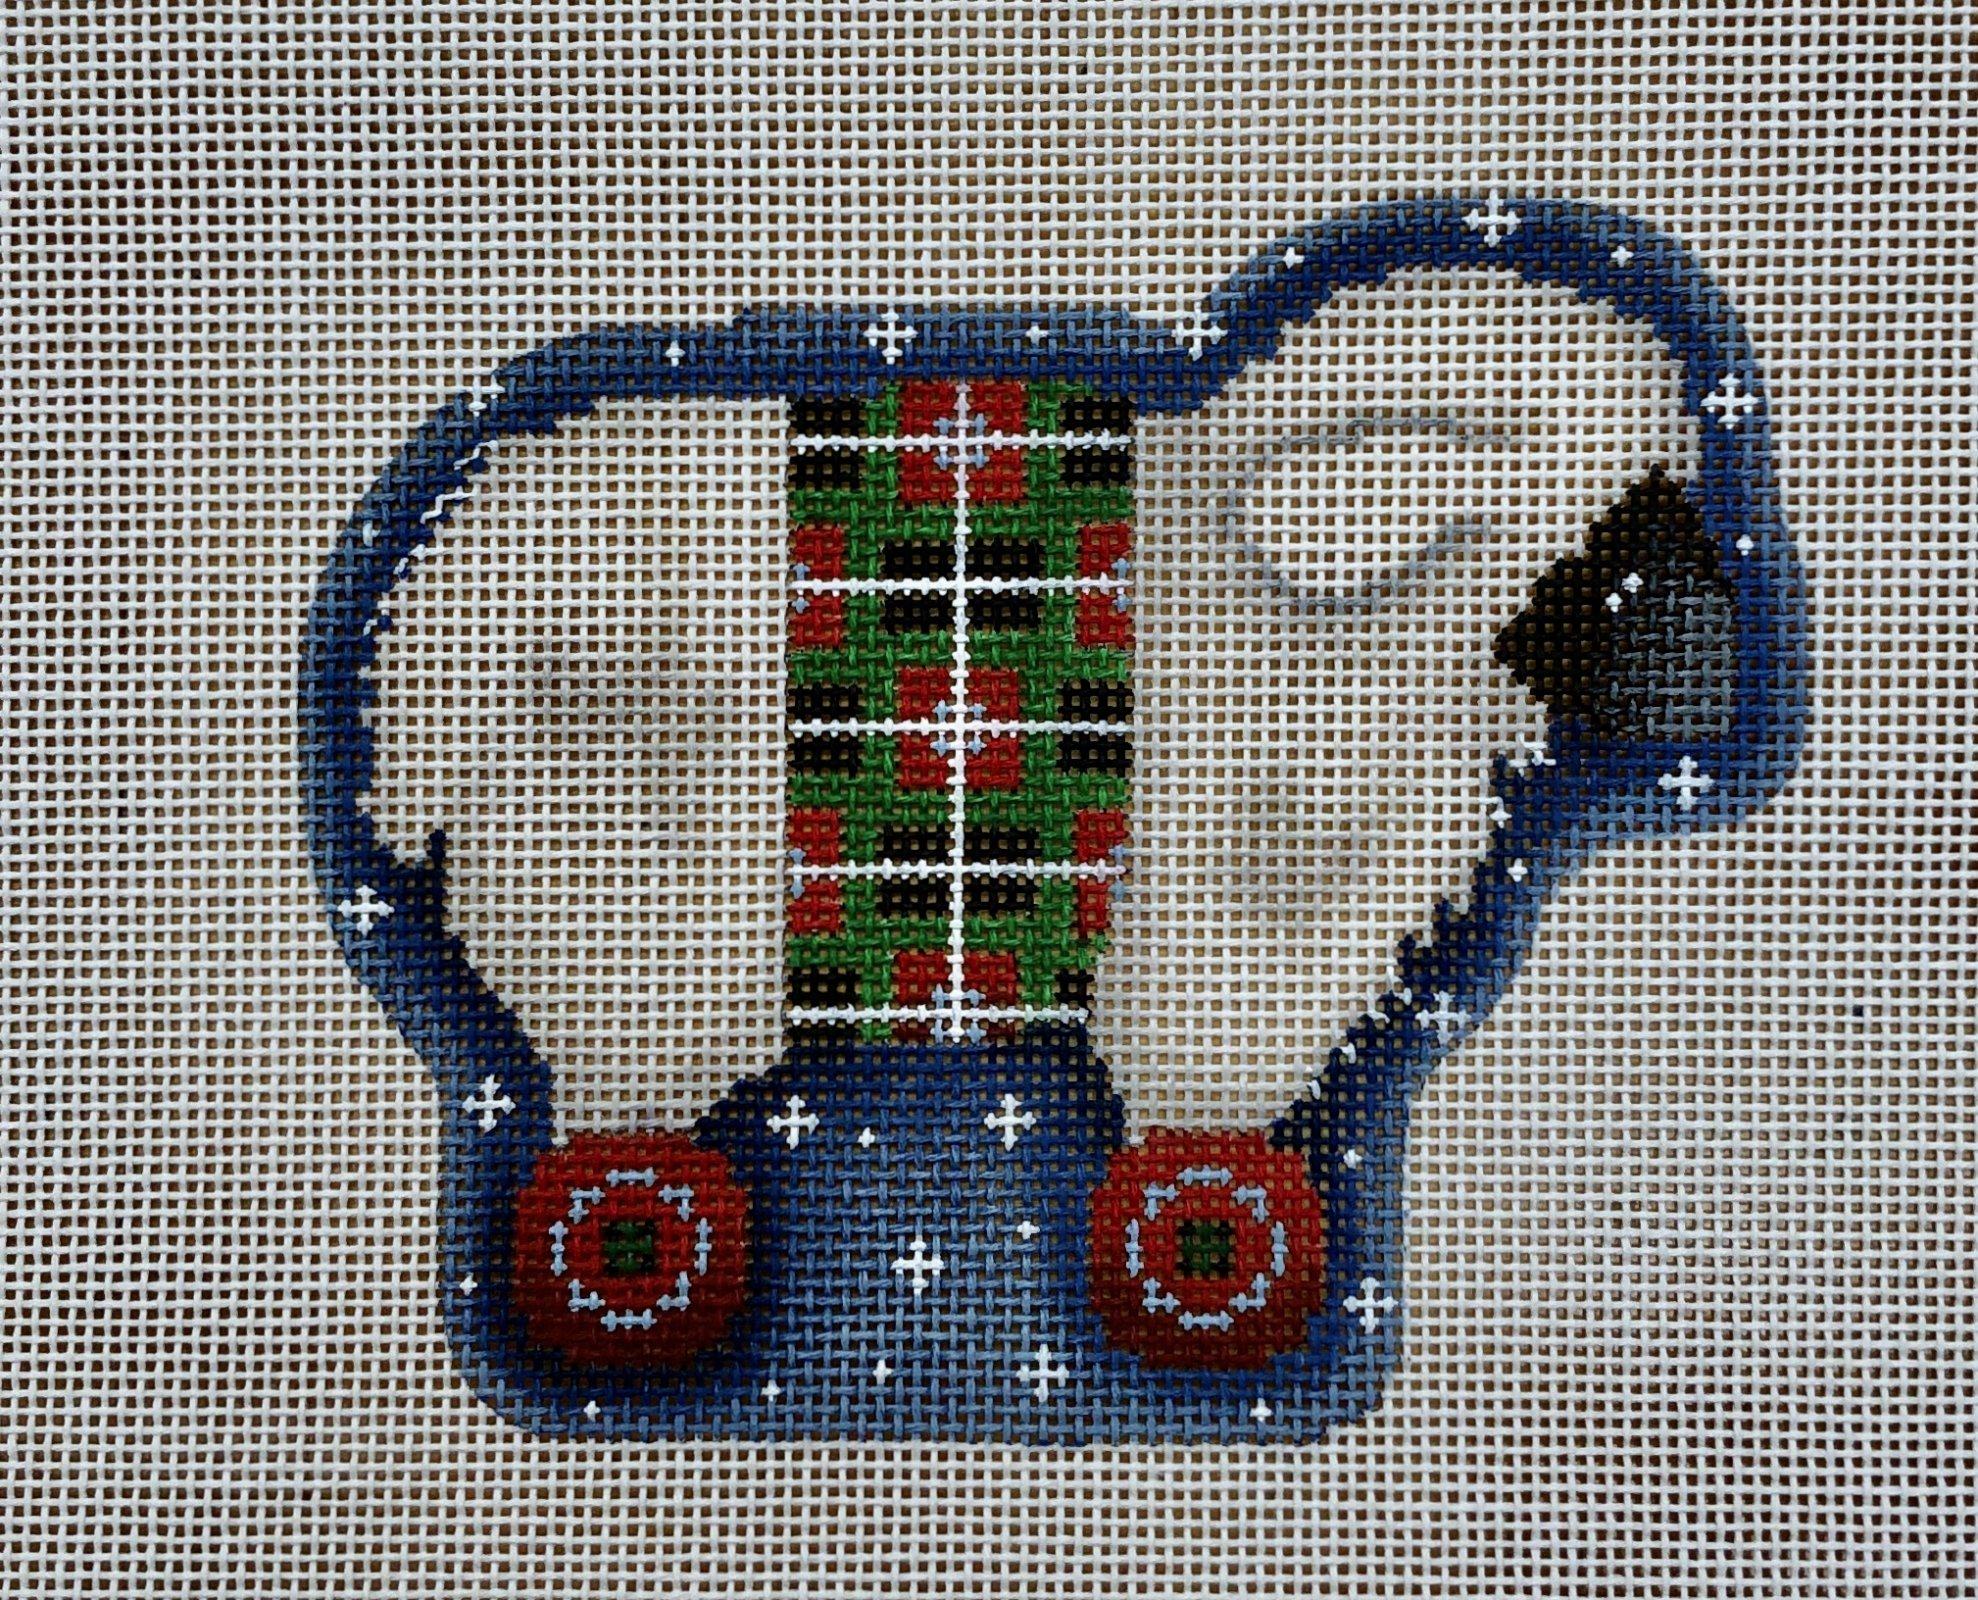 white sheep wheels ornament